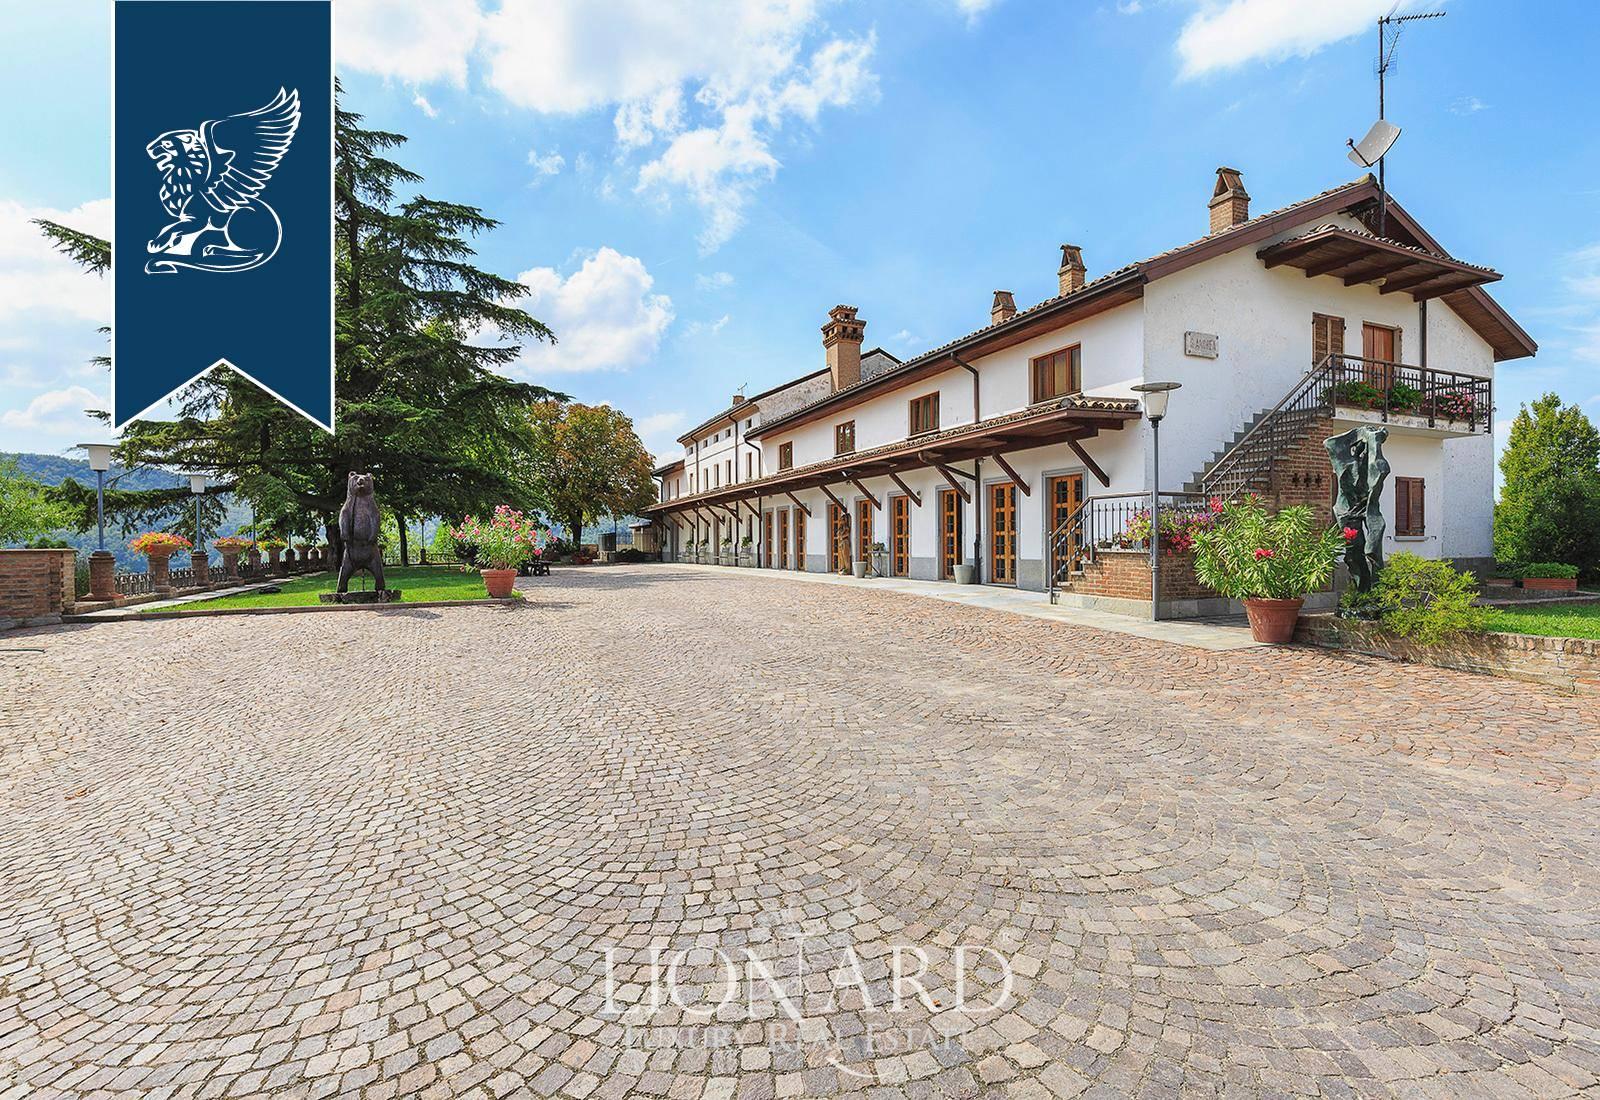 Azienda in Vendita a Pavia: 0 locali, 670 mq - Foto 8